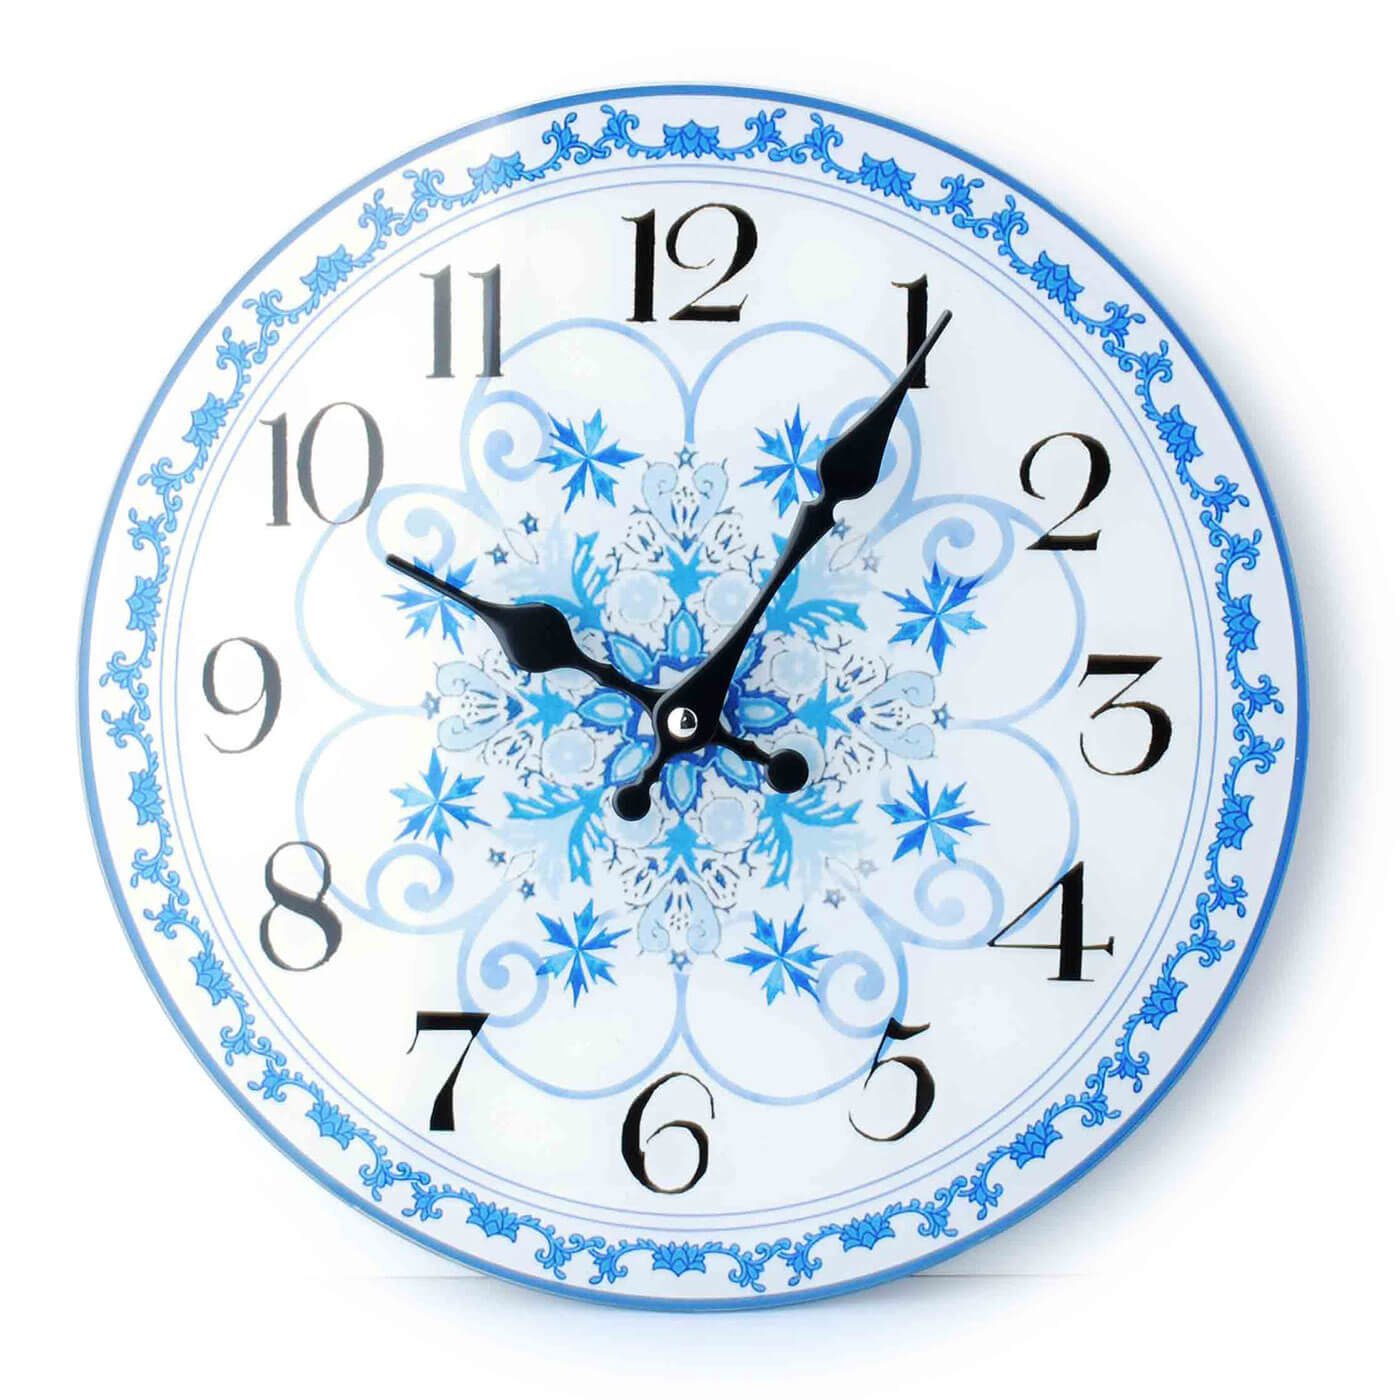 Nástenné hodiny Affek Design bielo-modré